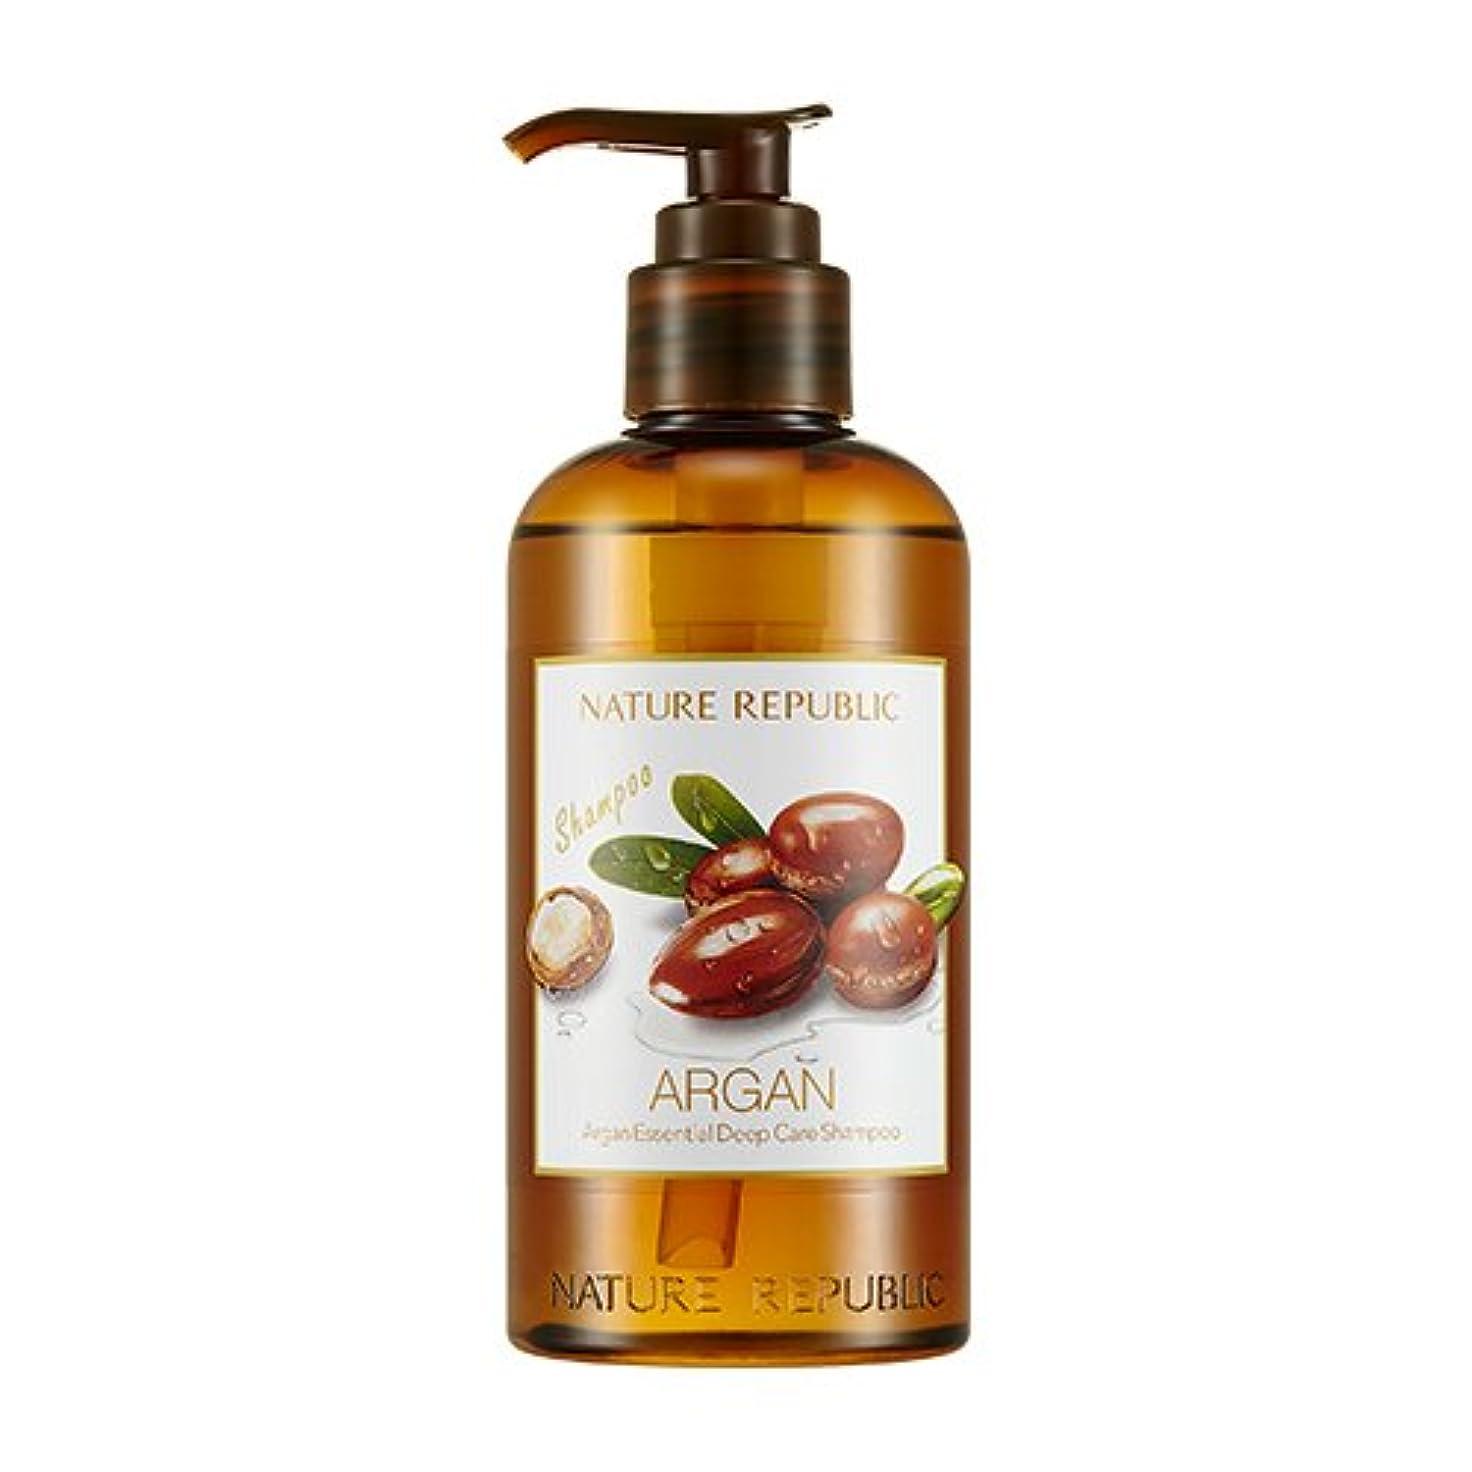 [ Renewal ]ネイチャーリパブリック NATURE REPUBLIC アルガン エッセンシャル ディープ ケア シャンプー Argan Essential Deep Care Shampoo 300ml [並行輸入品]